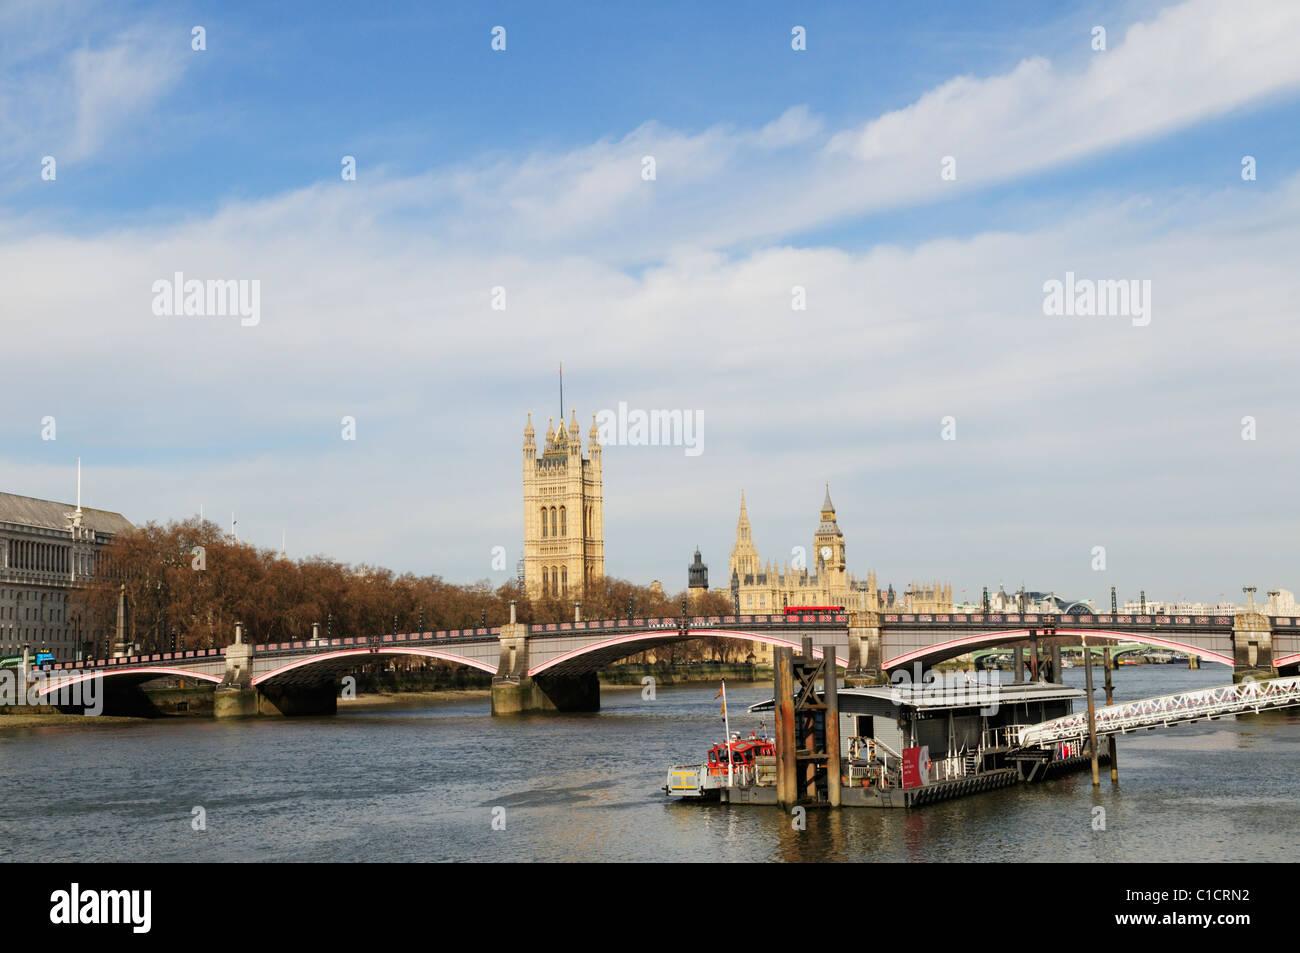 Lambeth Bridge with London Fire Brigade Pier, London, England, UK - Stock Image